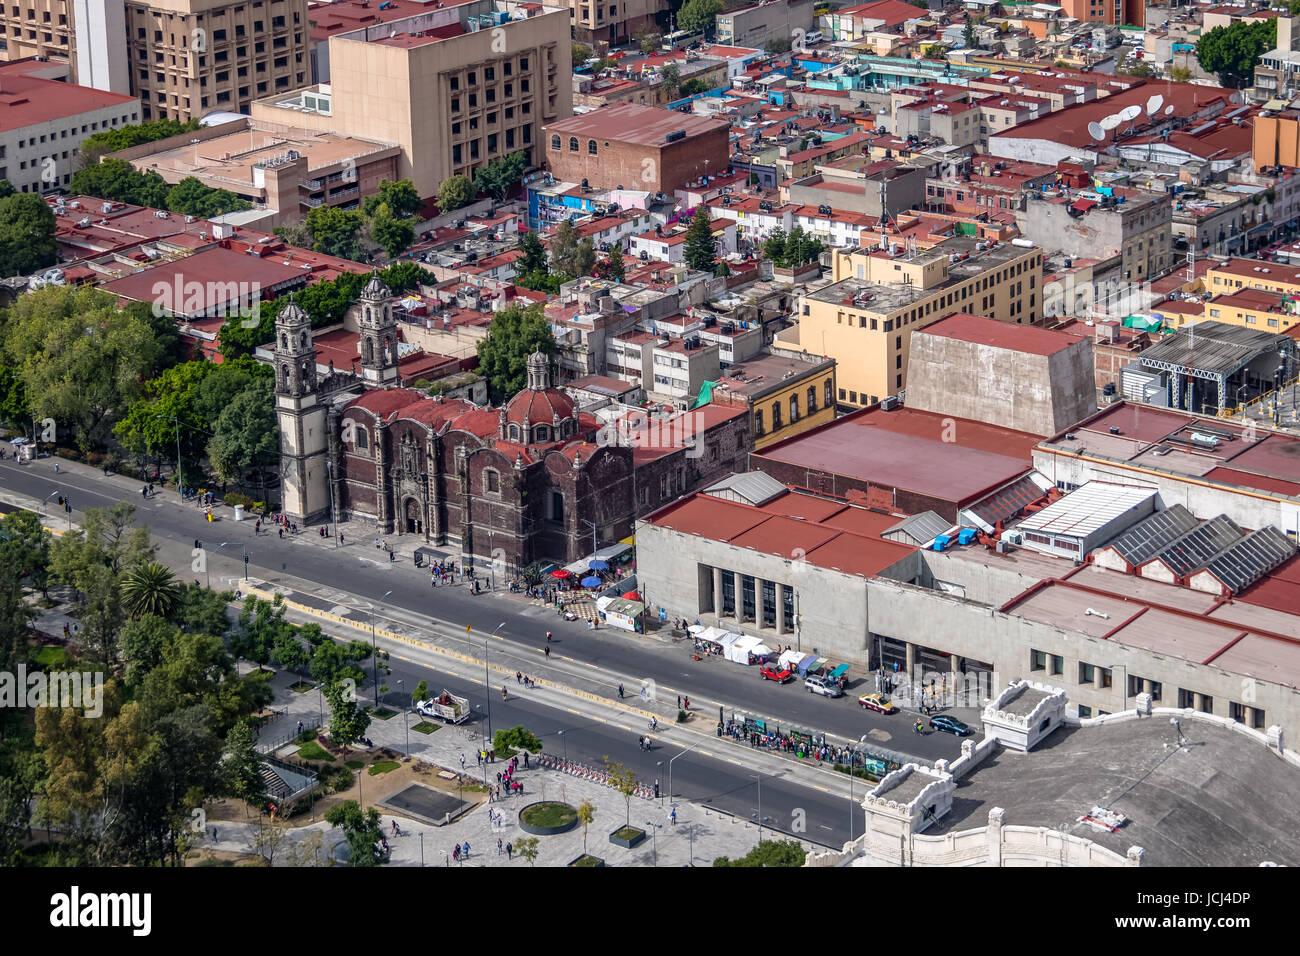 Aerial view of Mexico City and Parroquia de la Santa Veracruz (Santa Veracruz Church) - Mexico City, Mexico - Stock Image